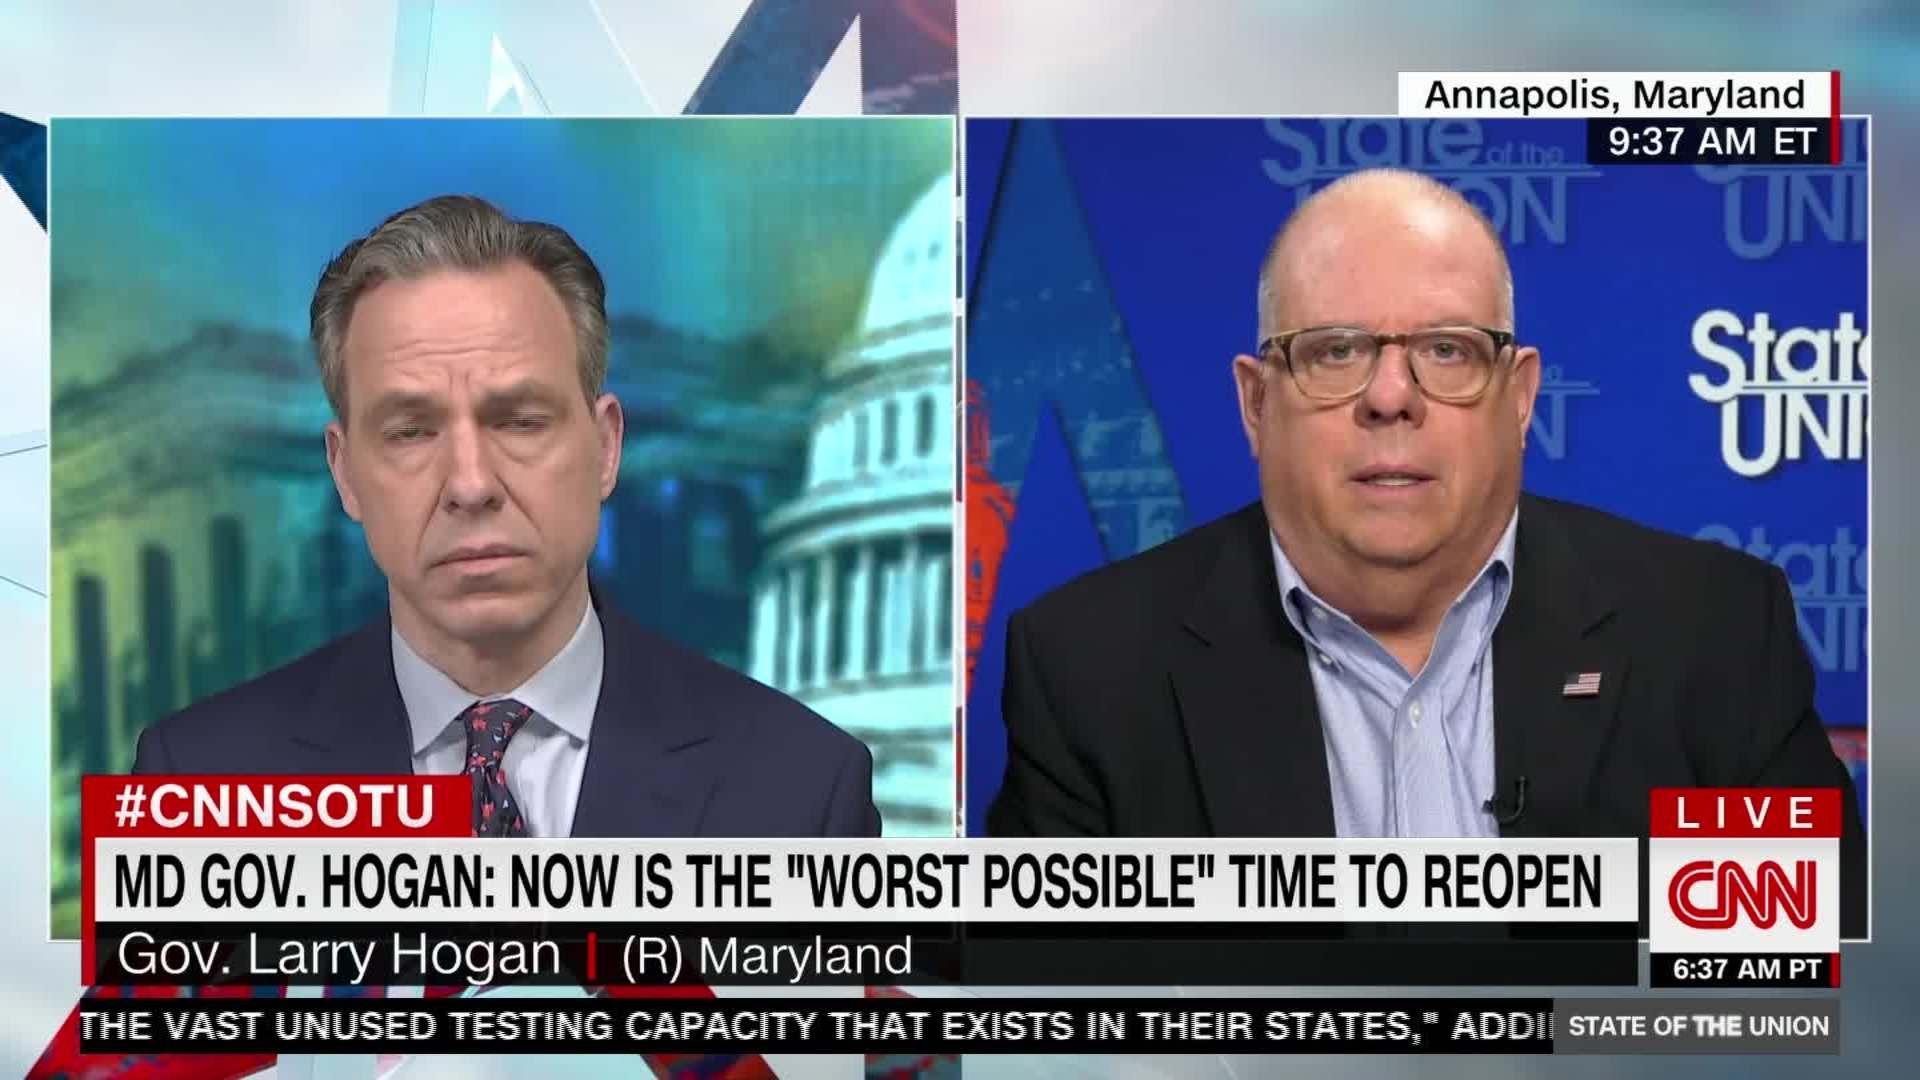 Hogan: 'Absolutely false' to blame govs over testing